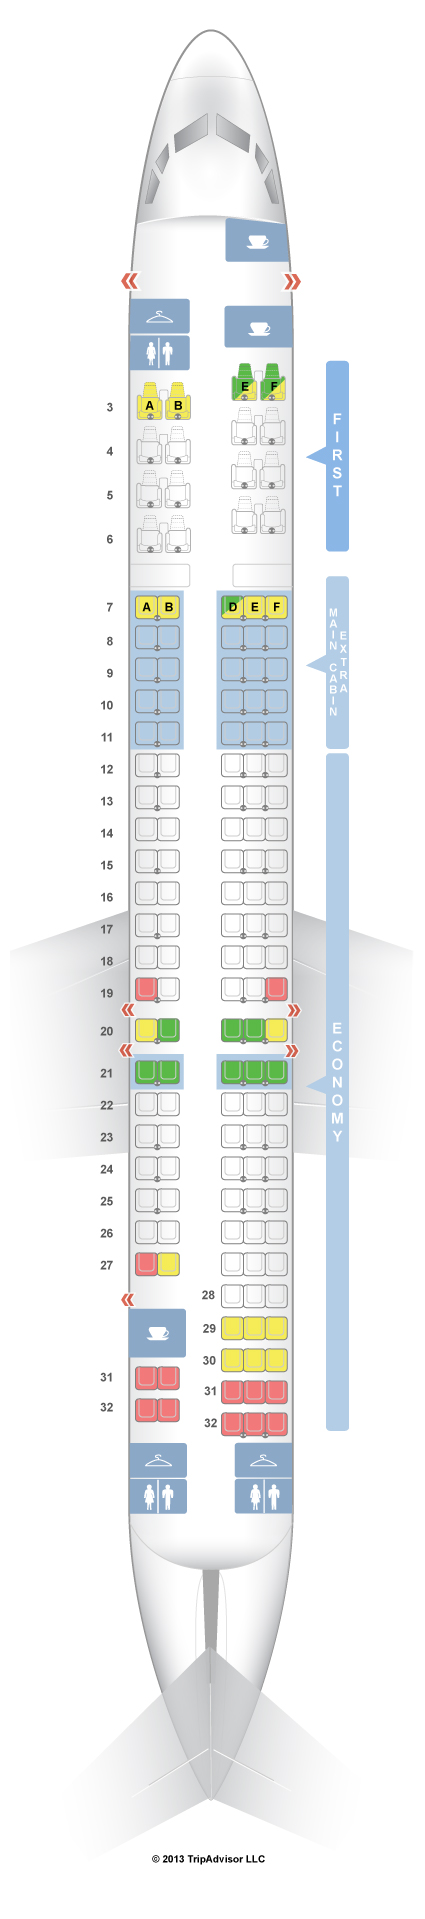 American Airline Md 80 Seating Chart Heartimpulsarco Eeb90d136930f938b9b8ec5afff369f0 Embraer Erj 175 Seat Map